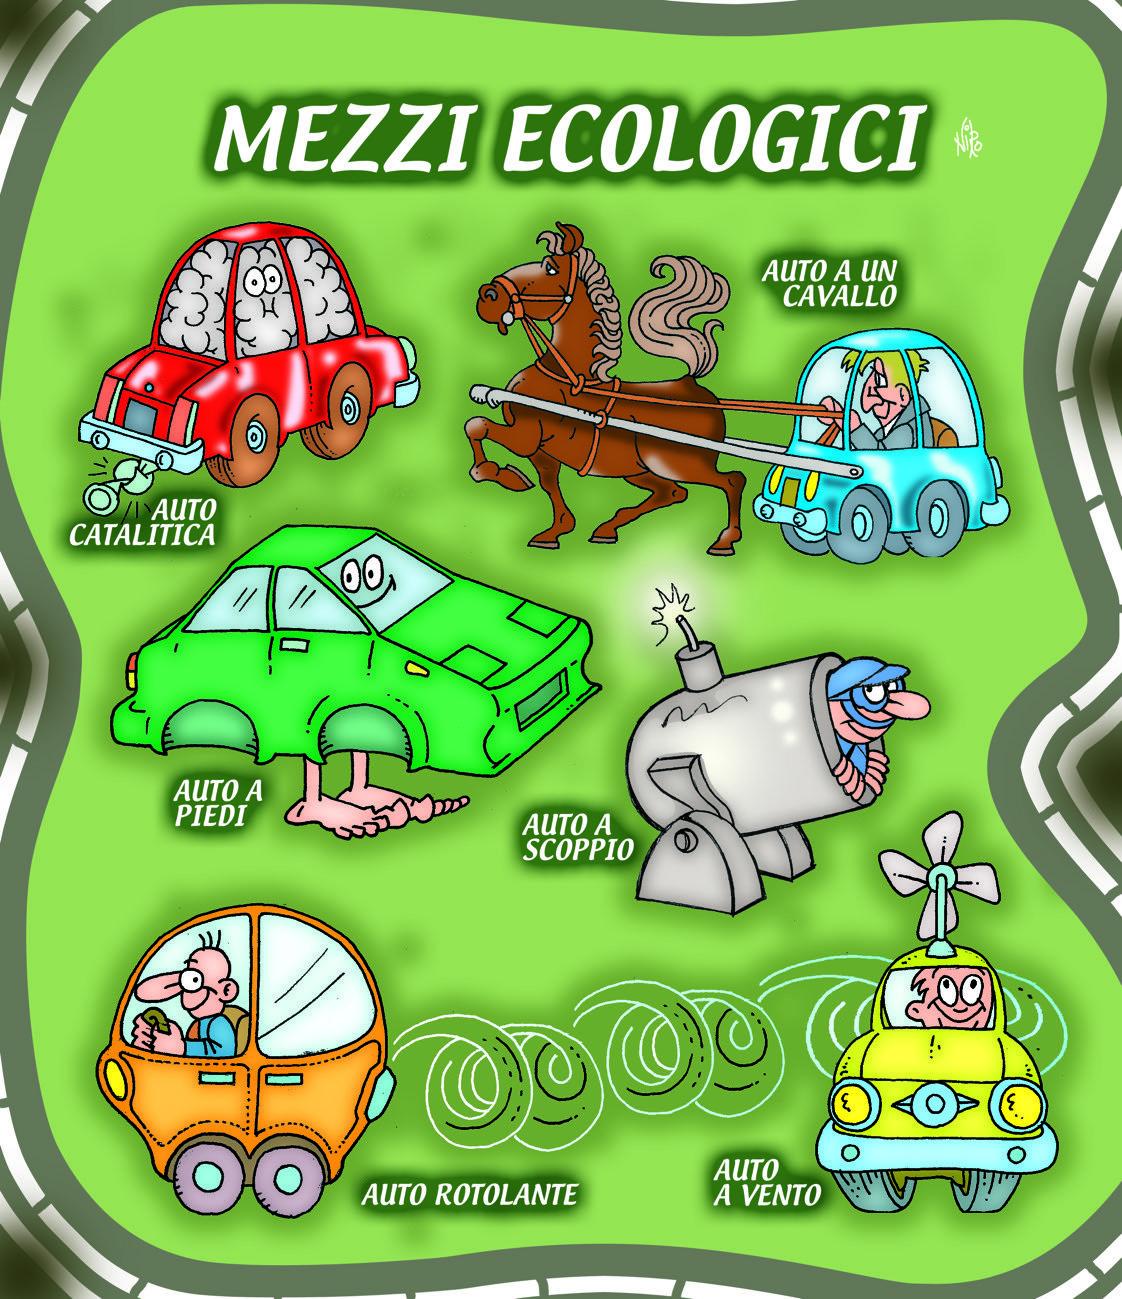 Mezzi Ecologici